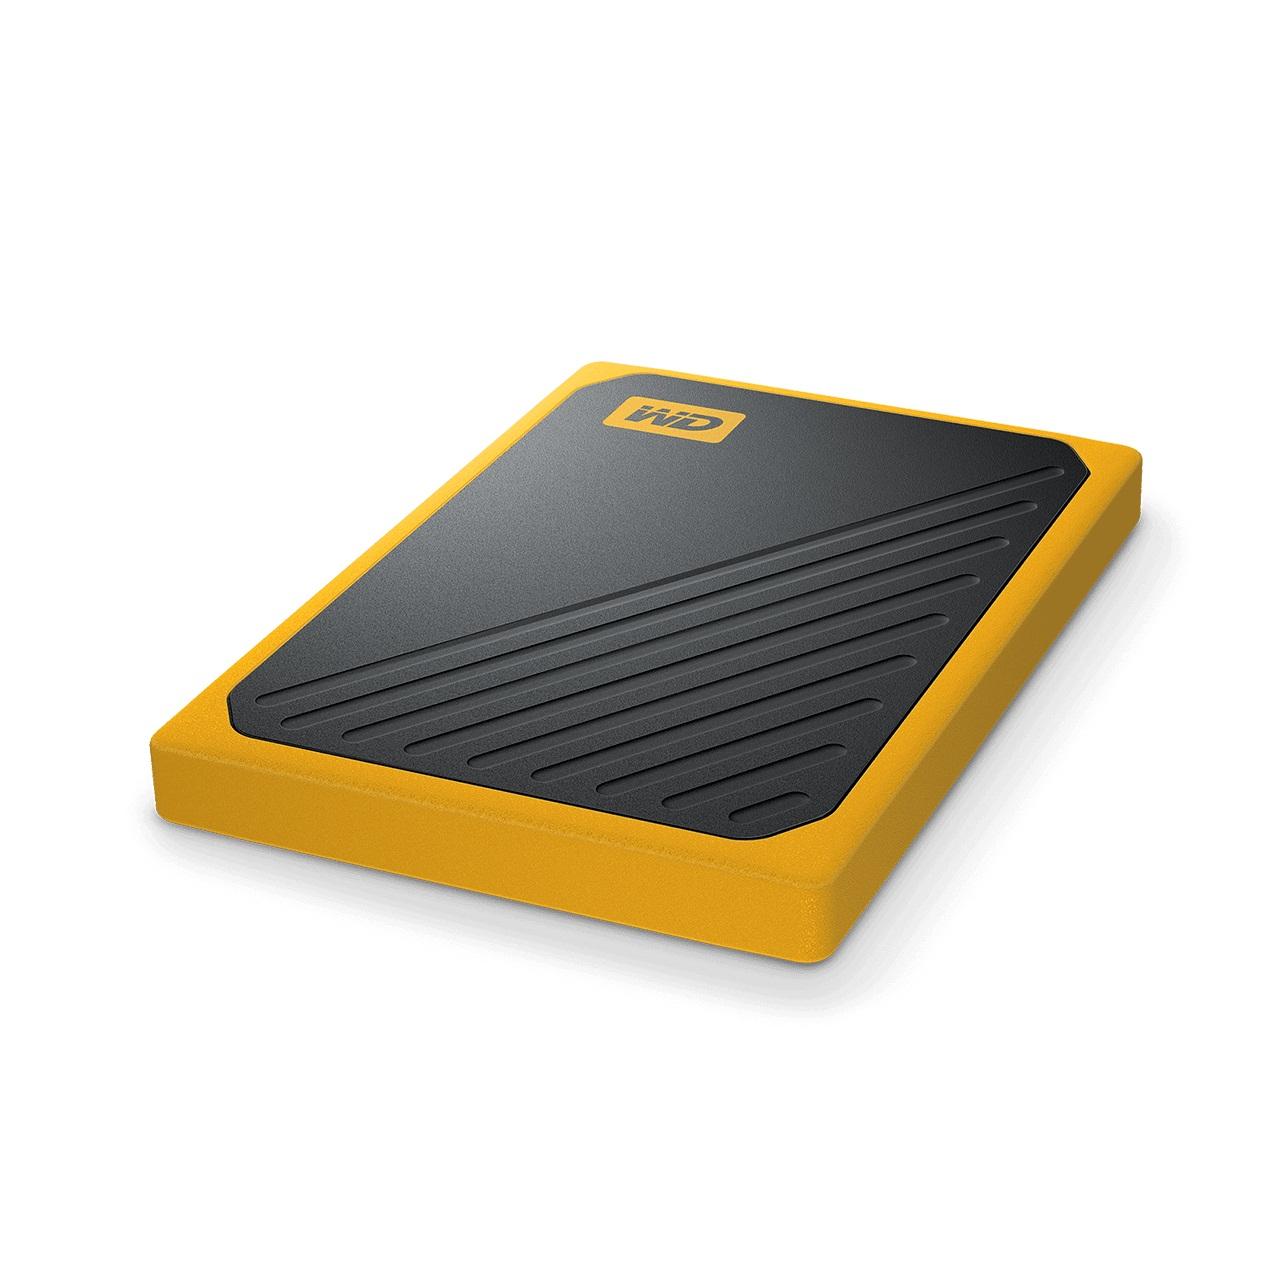 Western-Digital-WD-1TB-My-Passport-Go-Portable-External-SSD-Drive-All-Colour-VS thumbnail 4